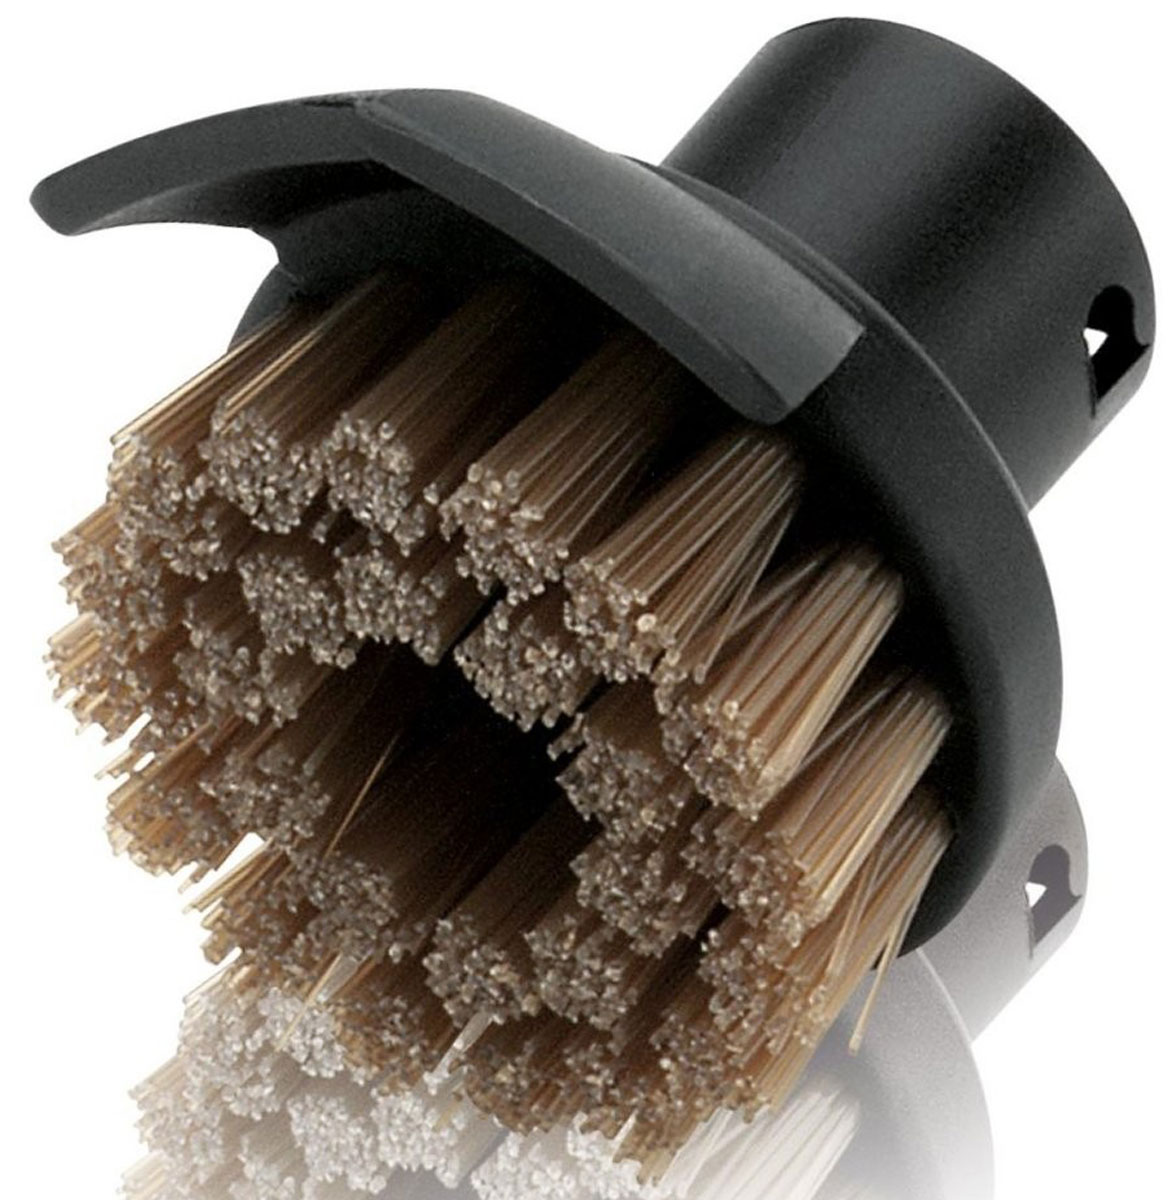 Karcher 28631400 насадка для пароочистителя насадка для очистки плоских поверхностей karcher t racer t 250 plus